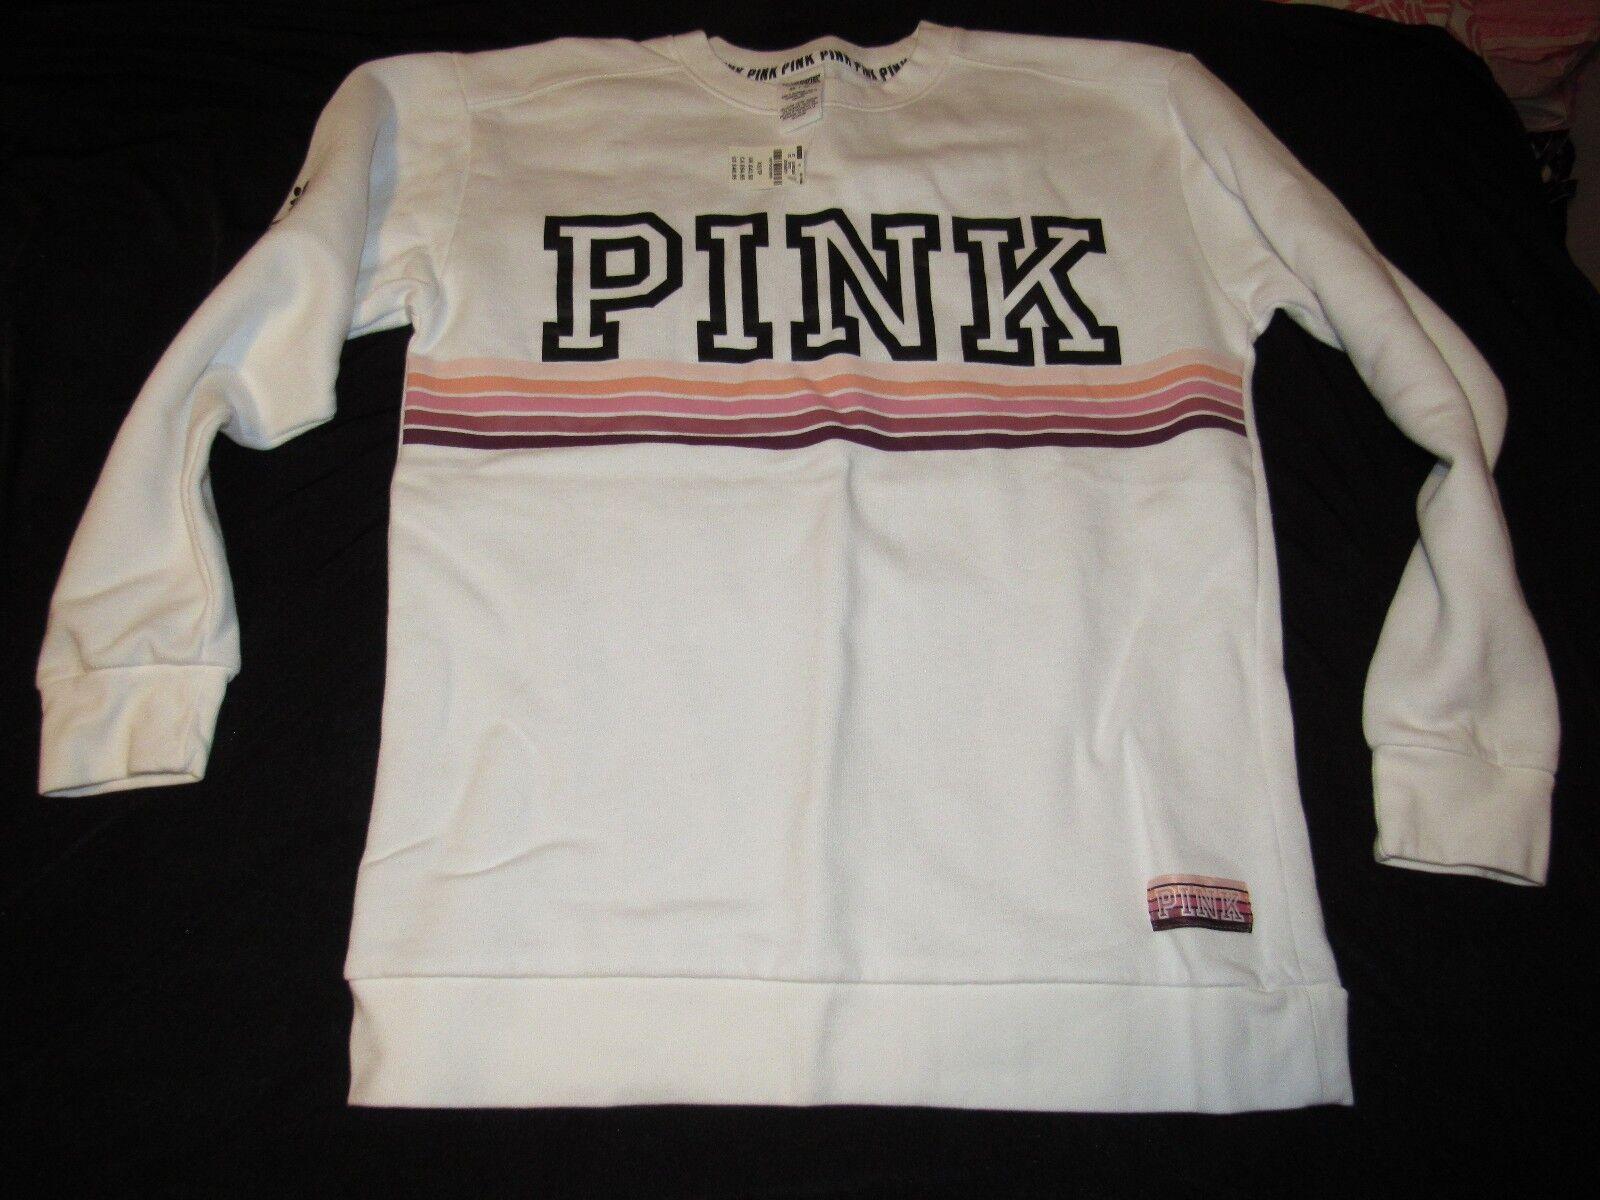 Victorias Secret Campus Crew Sweatshirt Size XSmall NWT Birthday Gift PINK Top Nrokwp15 Hoodies Sweatshirts